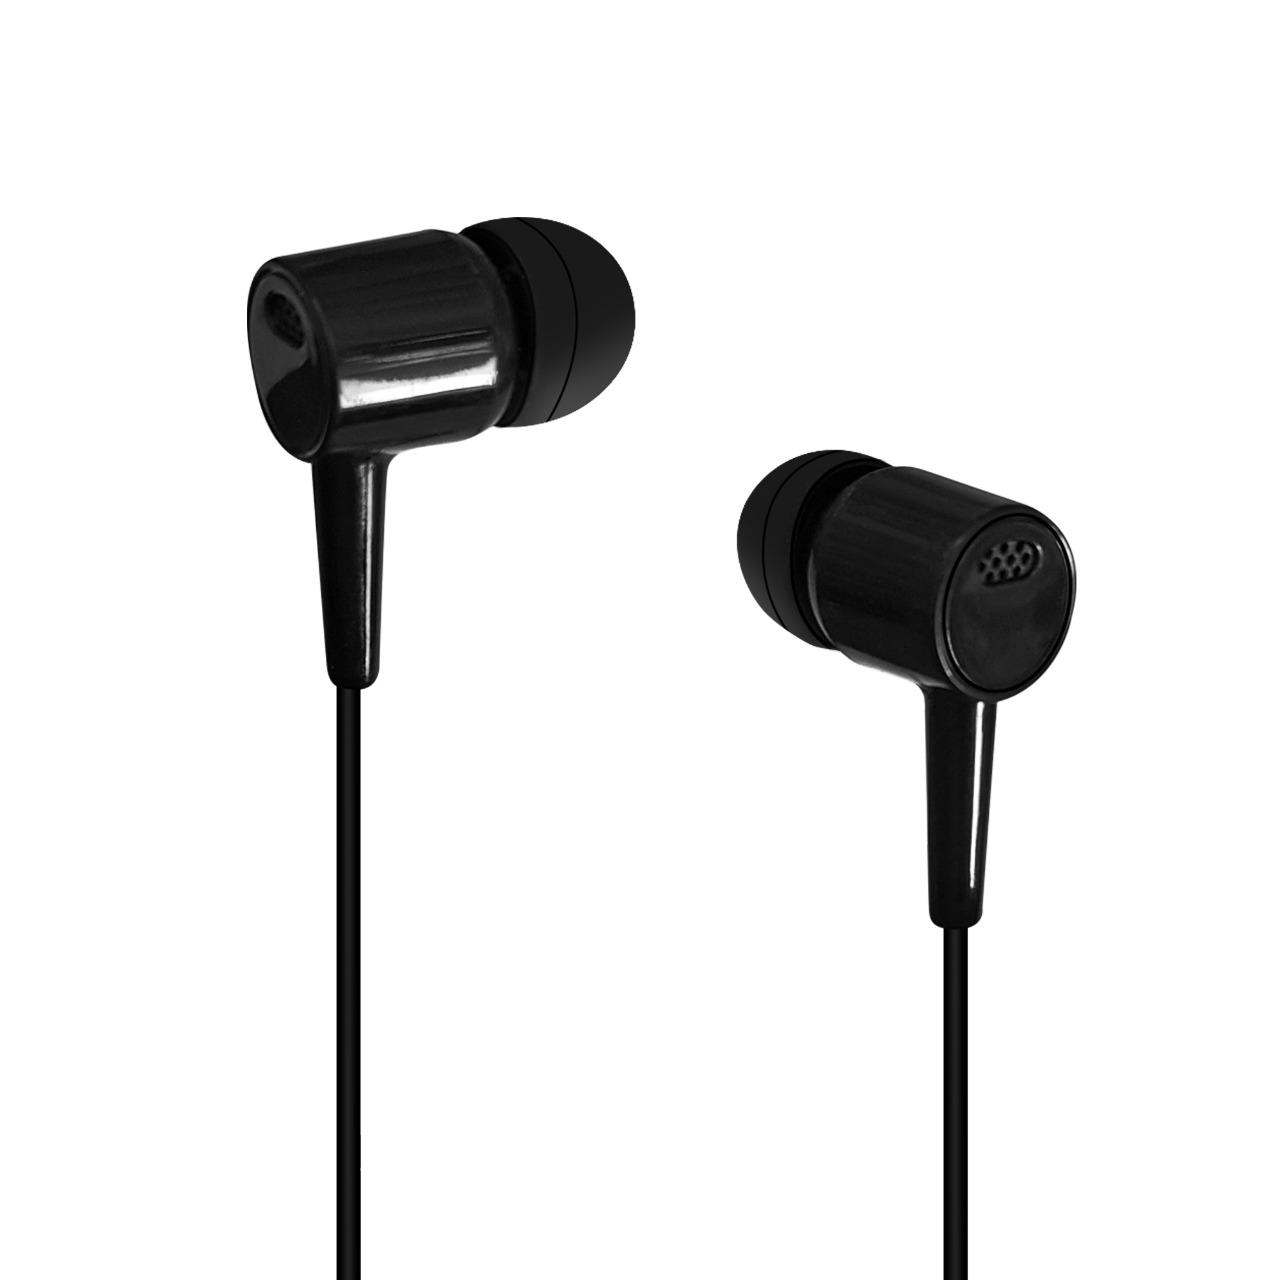 Signature VM 34 Universal Wired Headphone/Earphone